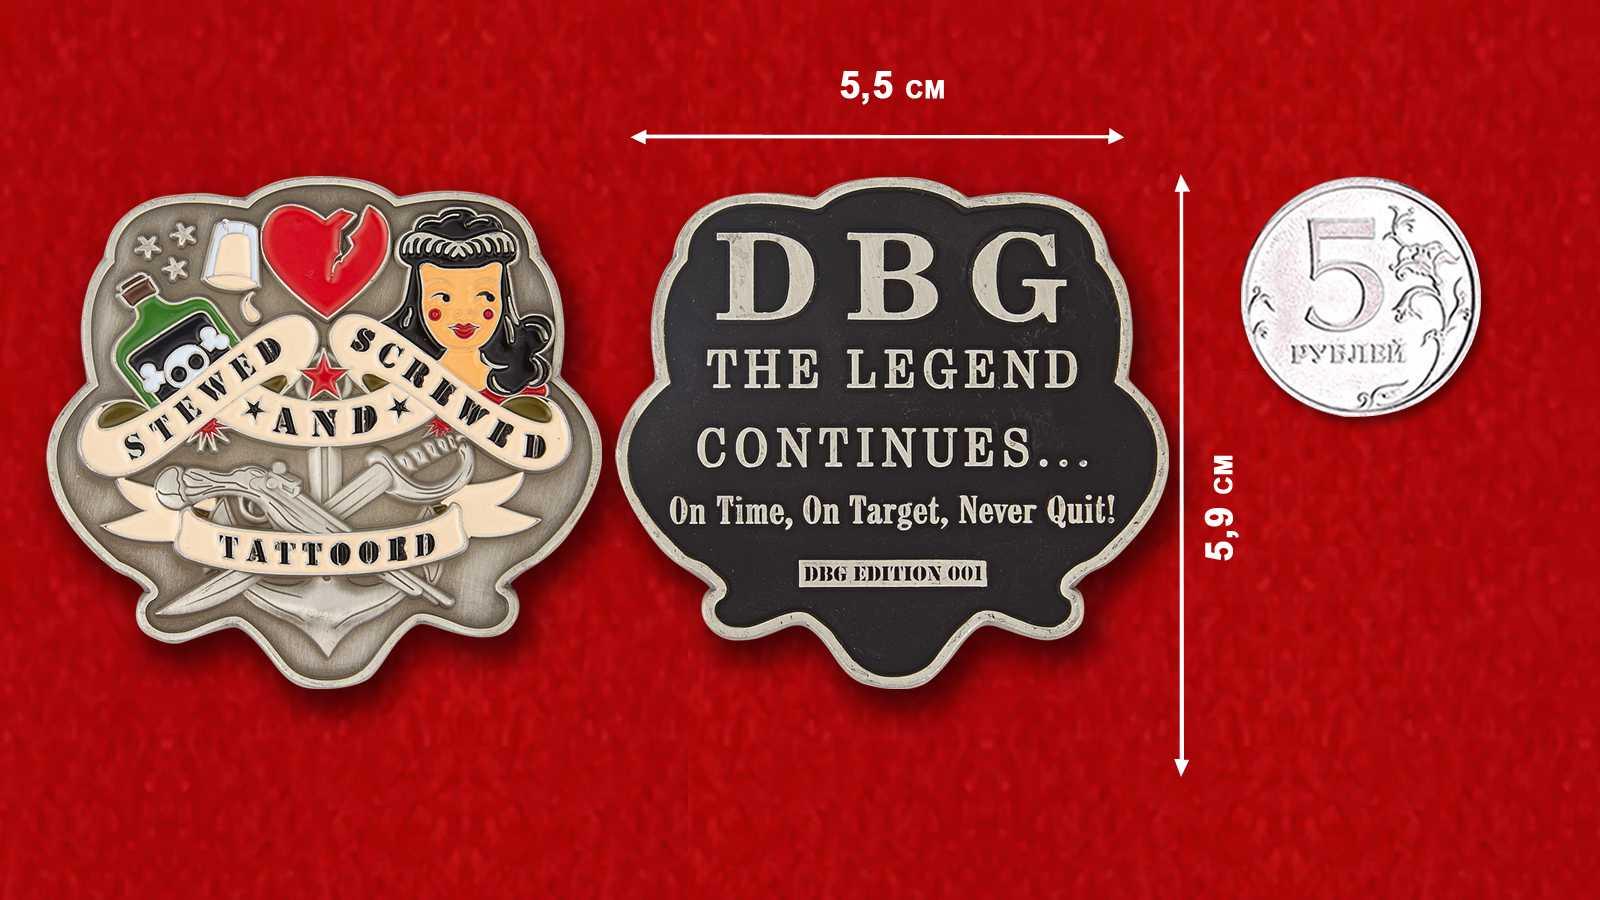 US Navy Special Warfare Combatant-Сraft Crewman DBG Edition-001 Challenge Coin